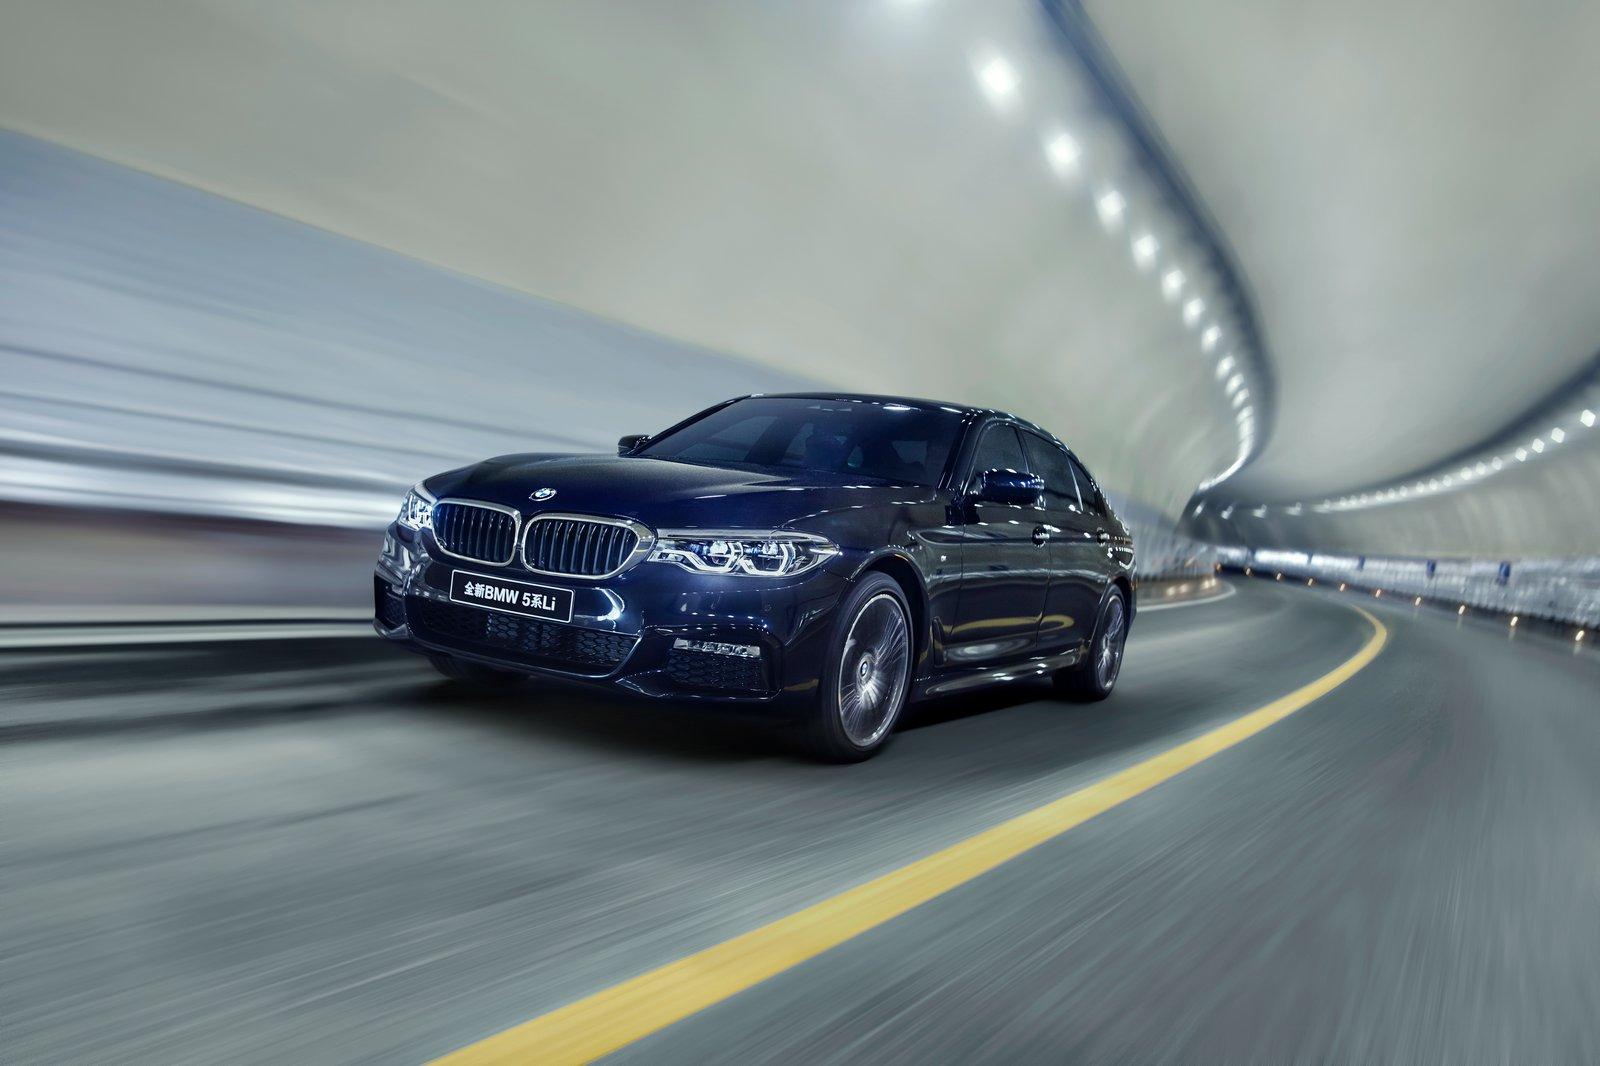 BMW-5-Series-LWB-16.jpg